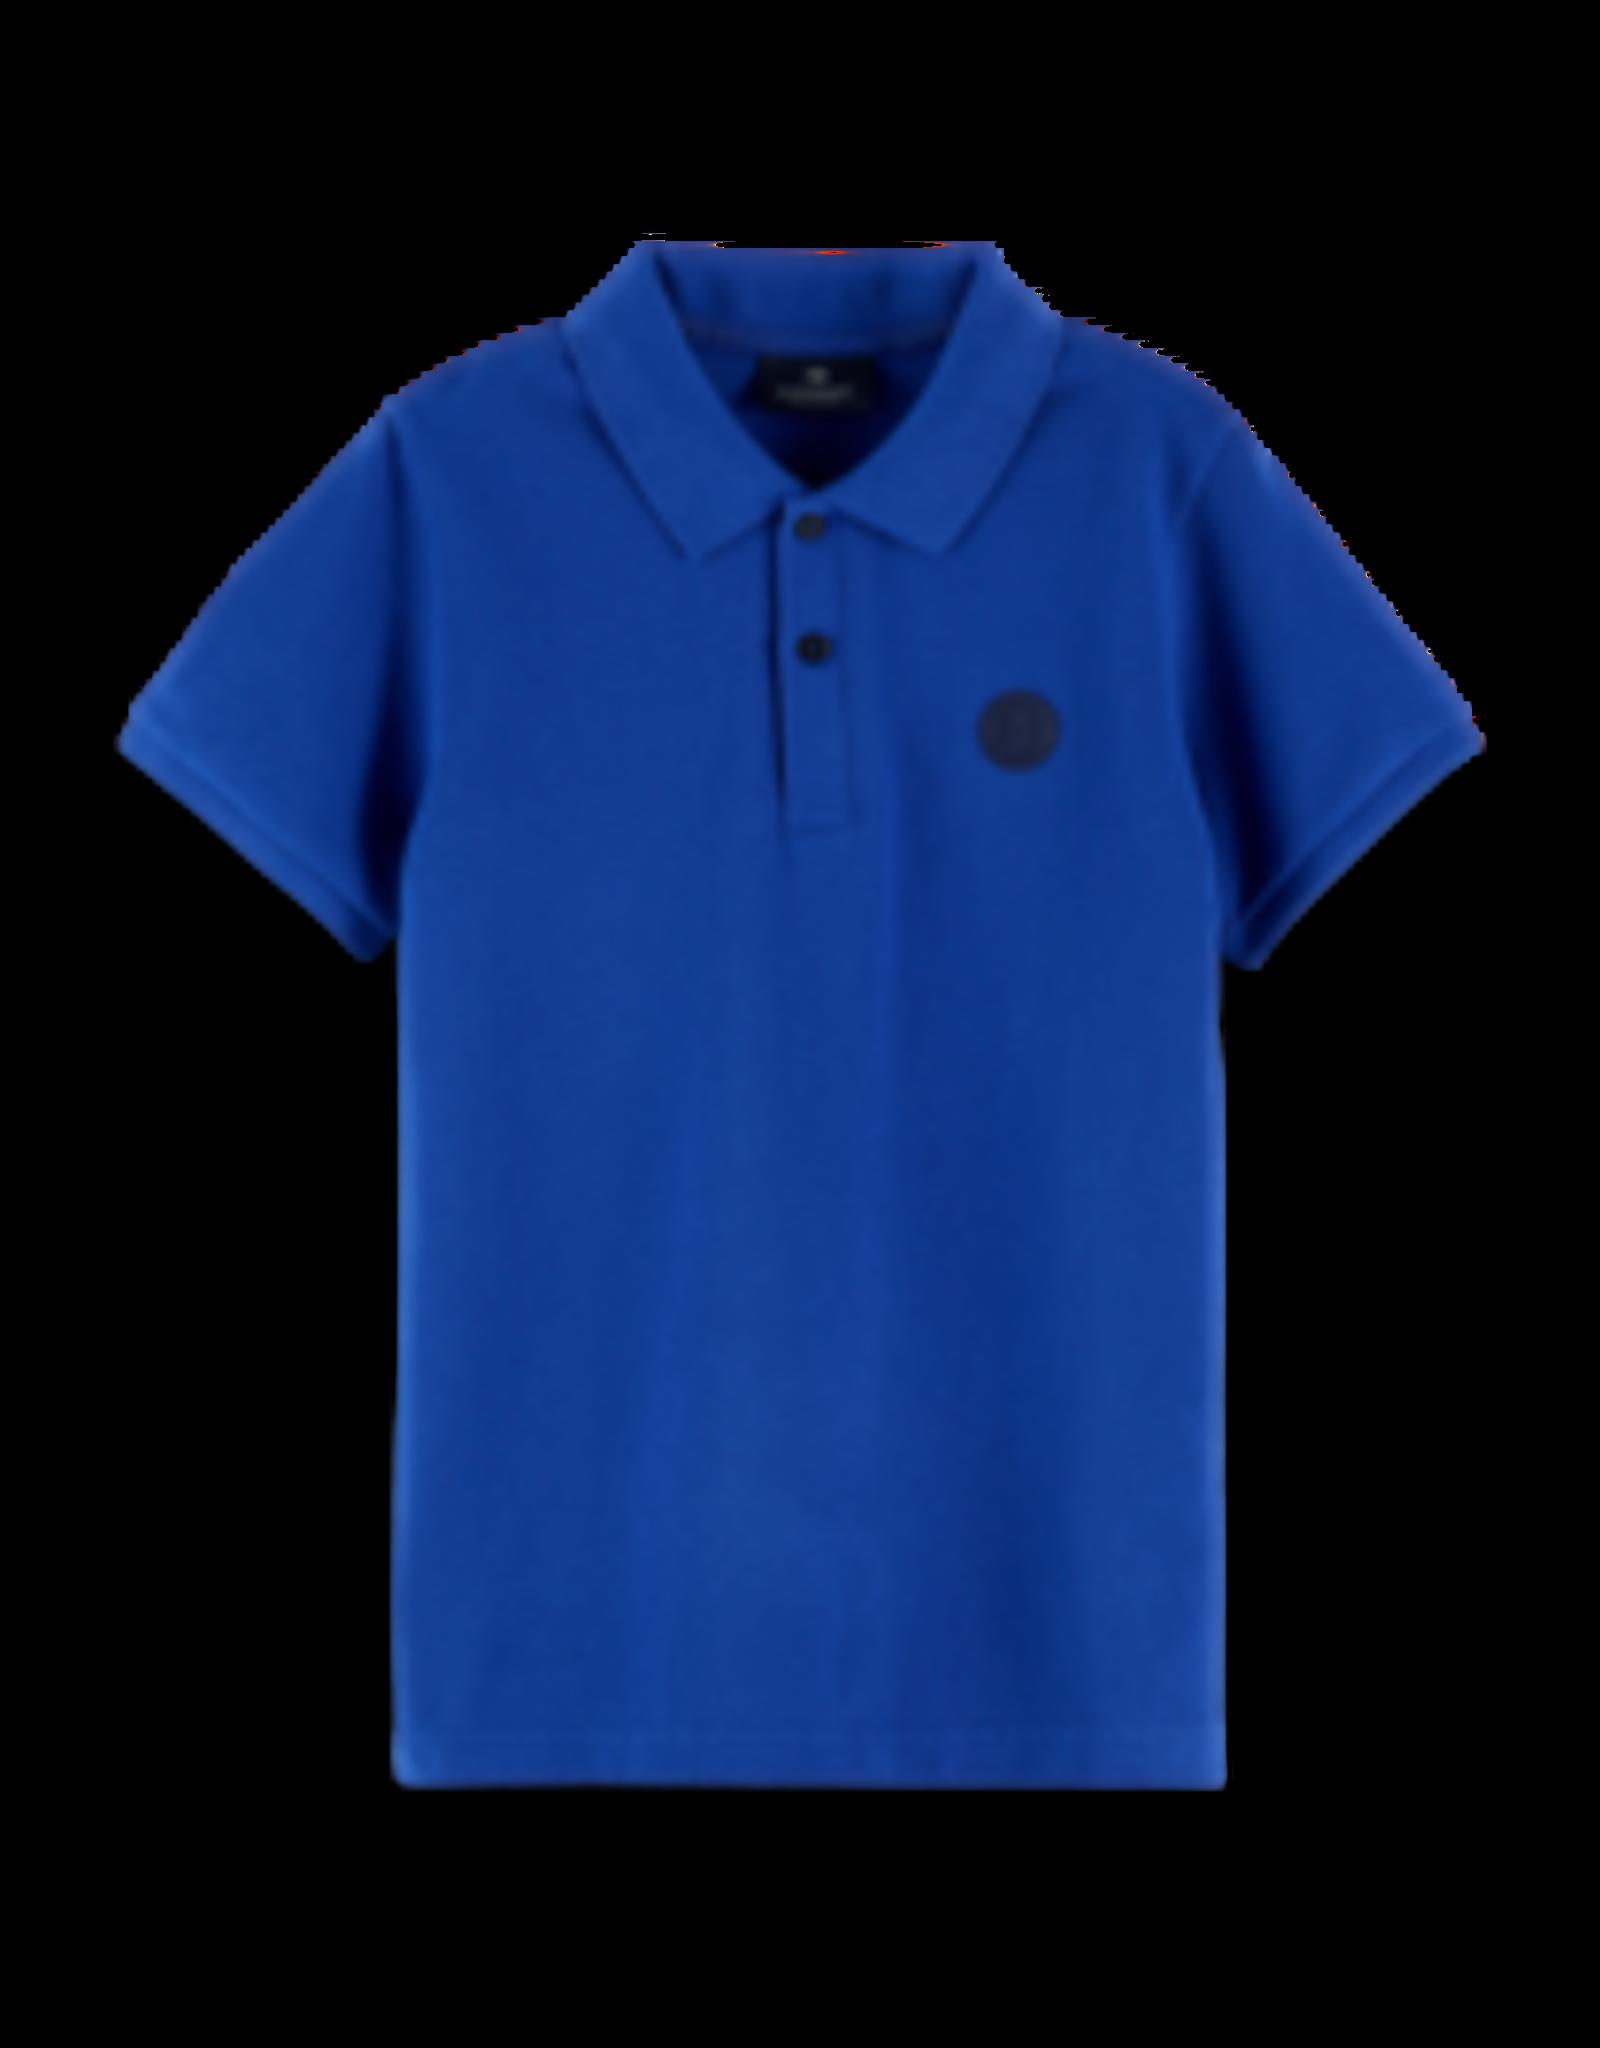 Scotch&Soda Shrunk SS21 160119 Polo with chest artwork blue